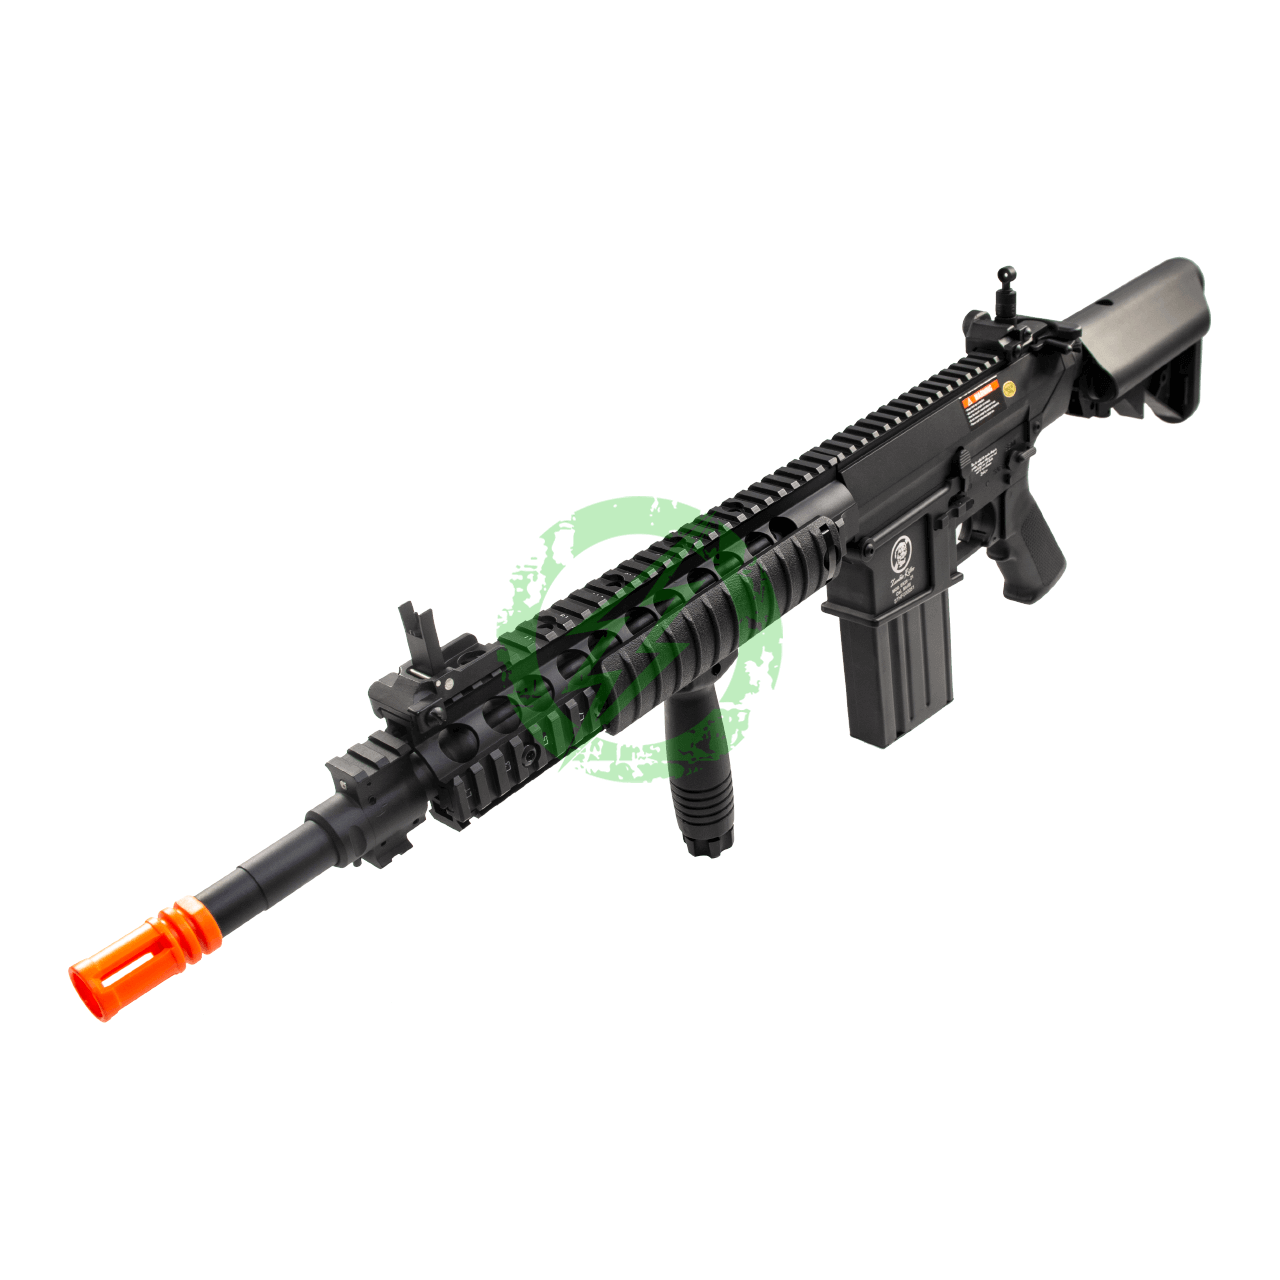 A&K Full Metal SR-25 Airsoft AEG Rifle | Zombie Killer Edition